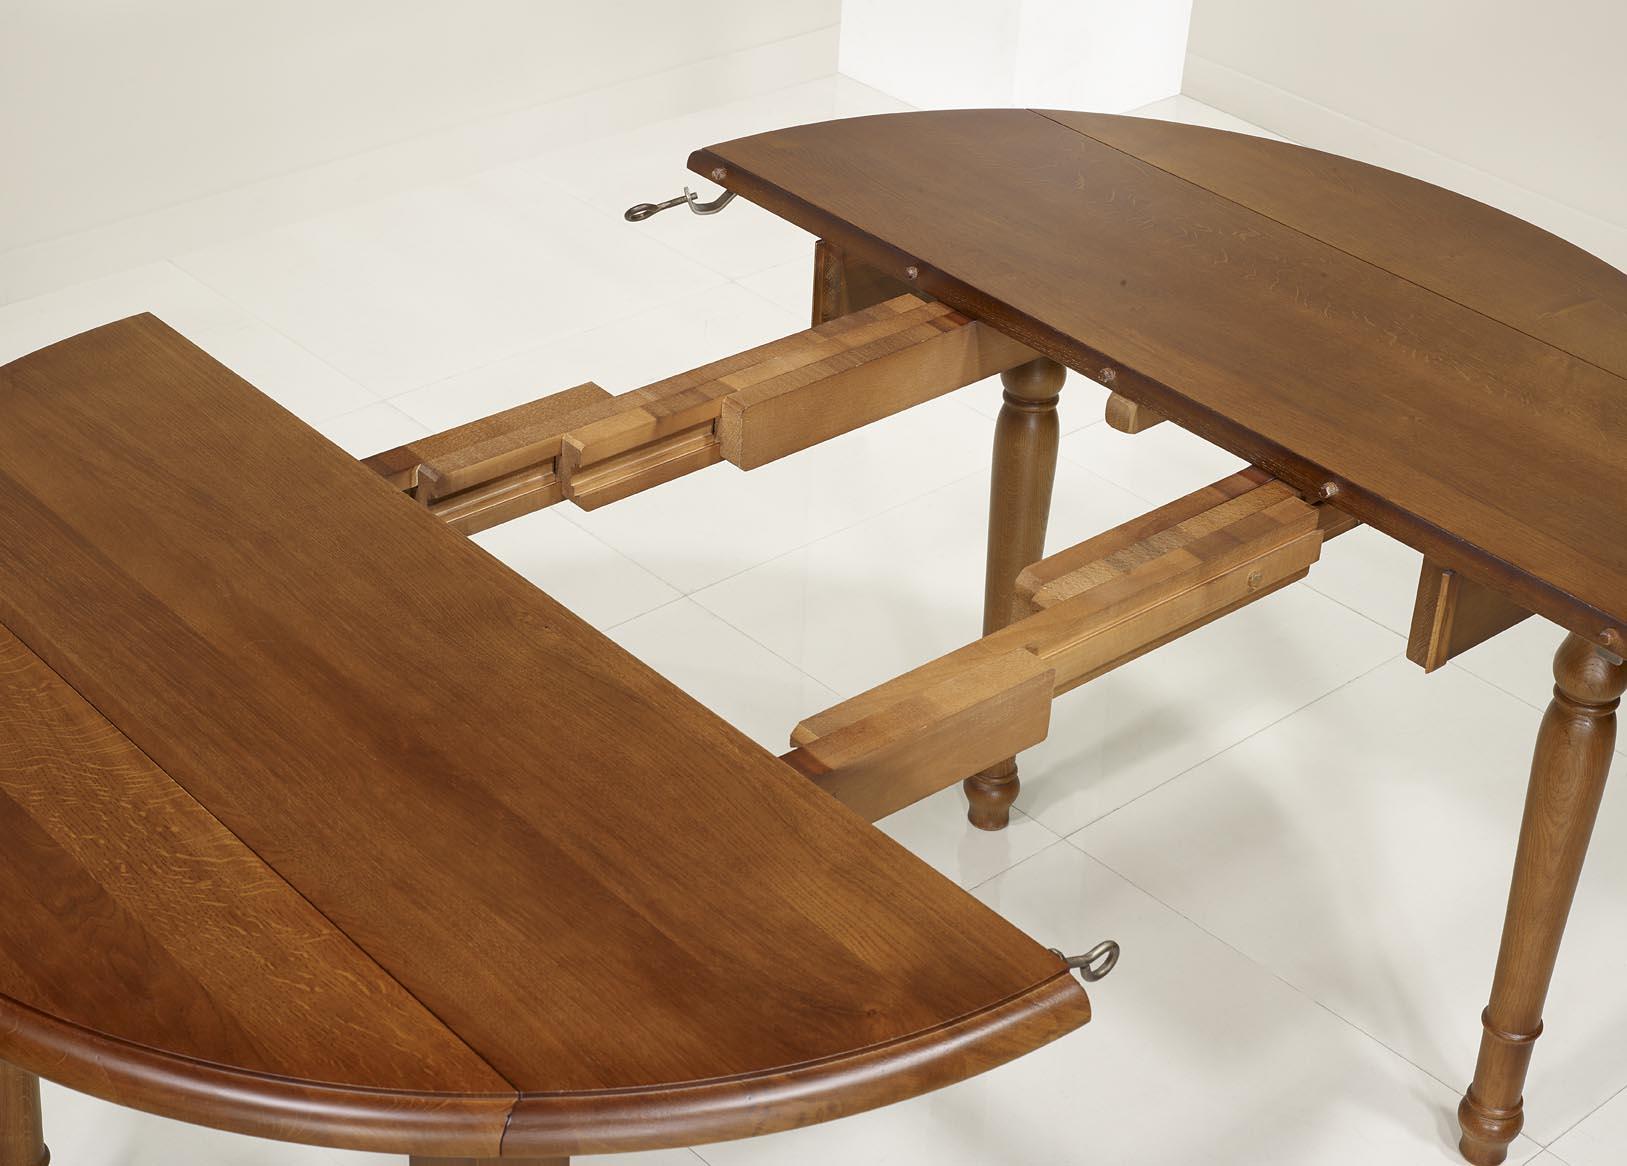 Table ronde 110 cm avec rallonge amazing gauche with for Plateau table ronde 110 cm